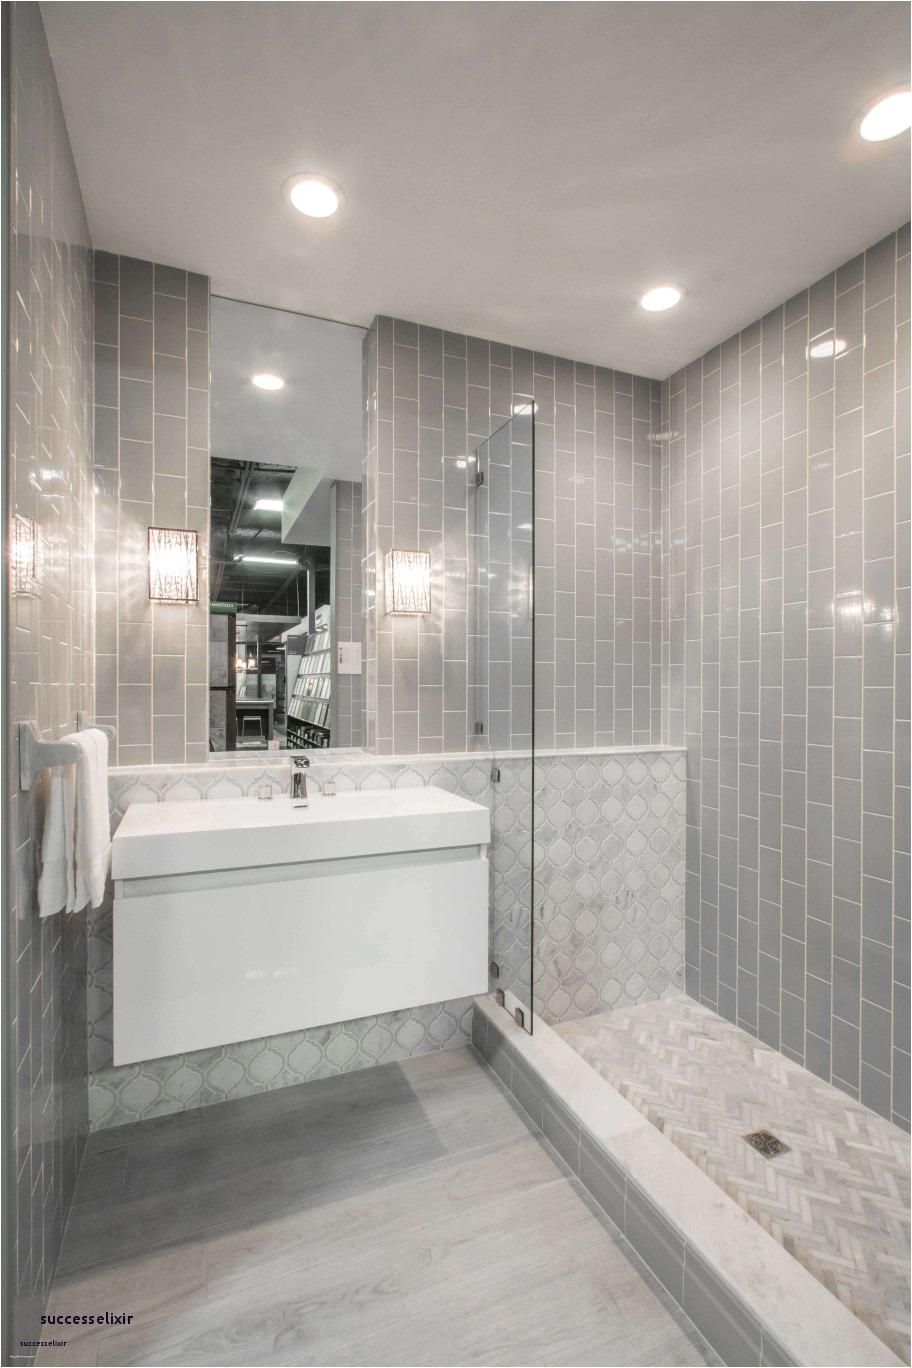 Bathroom Bath Tile Design Ideas Bath Tile Design